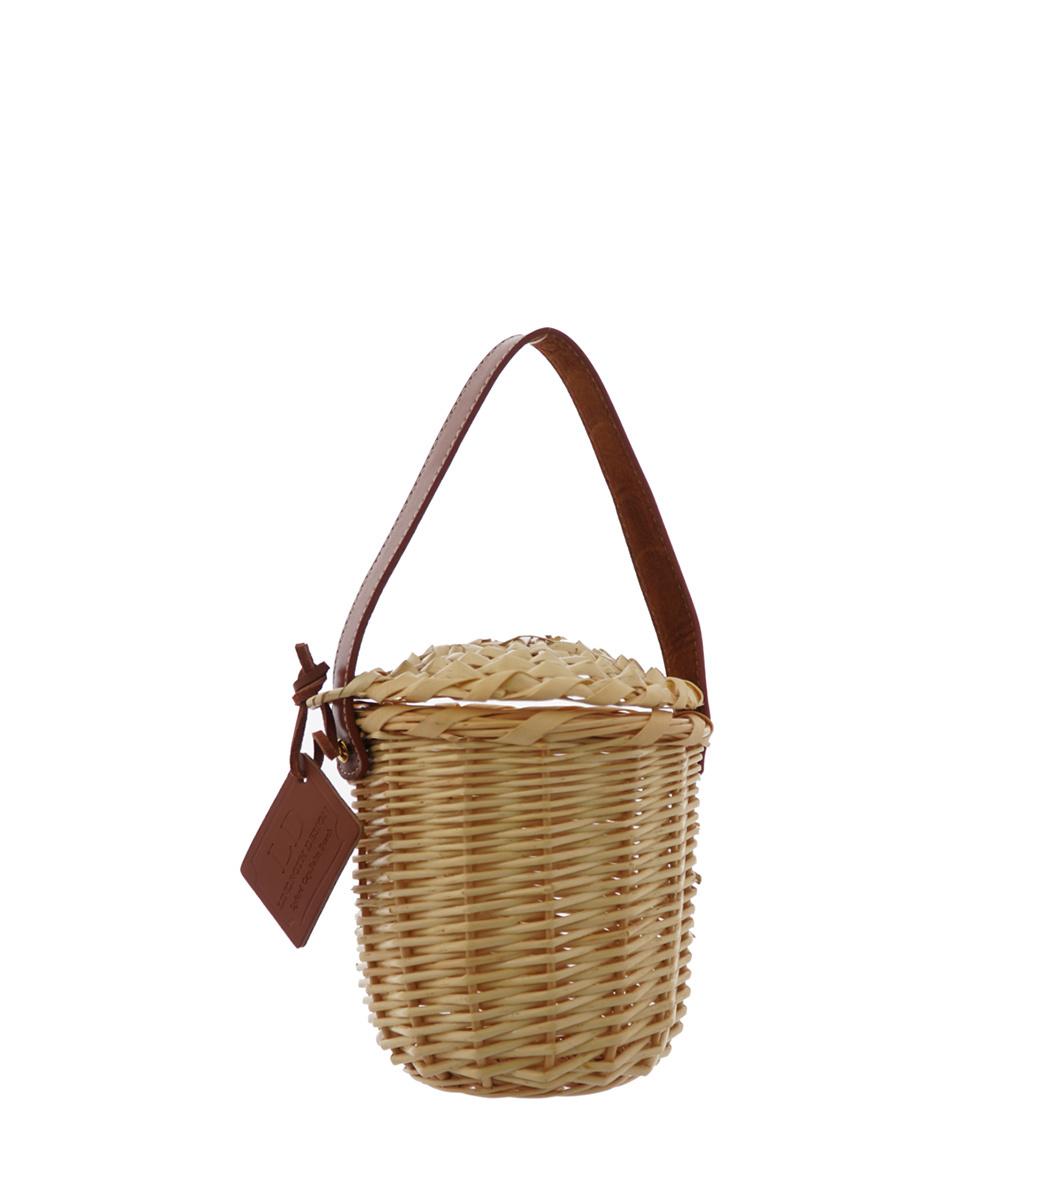 LINDROTH DESIGN Tan Mini Birkin Basket